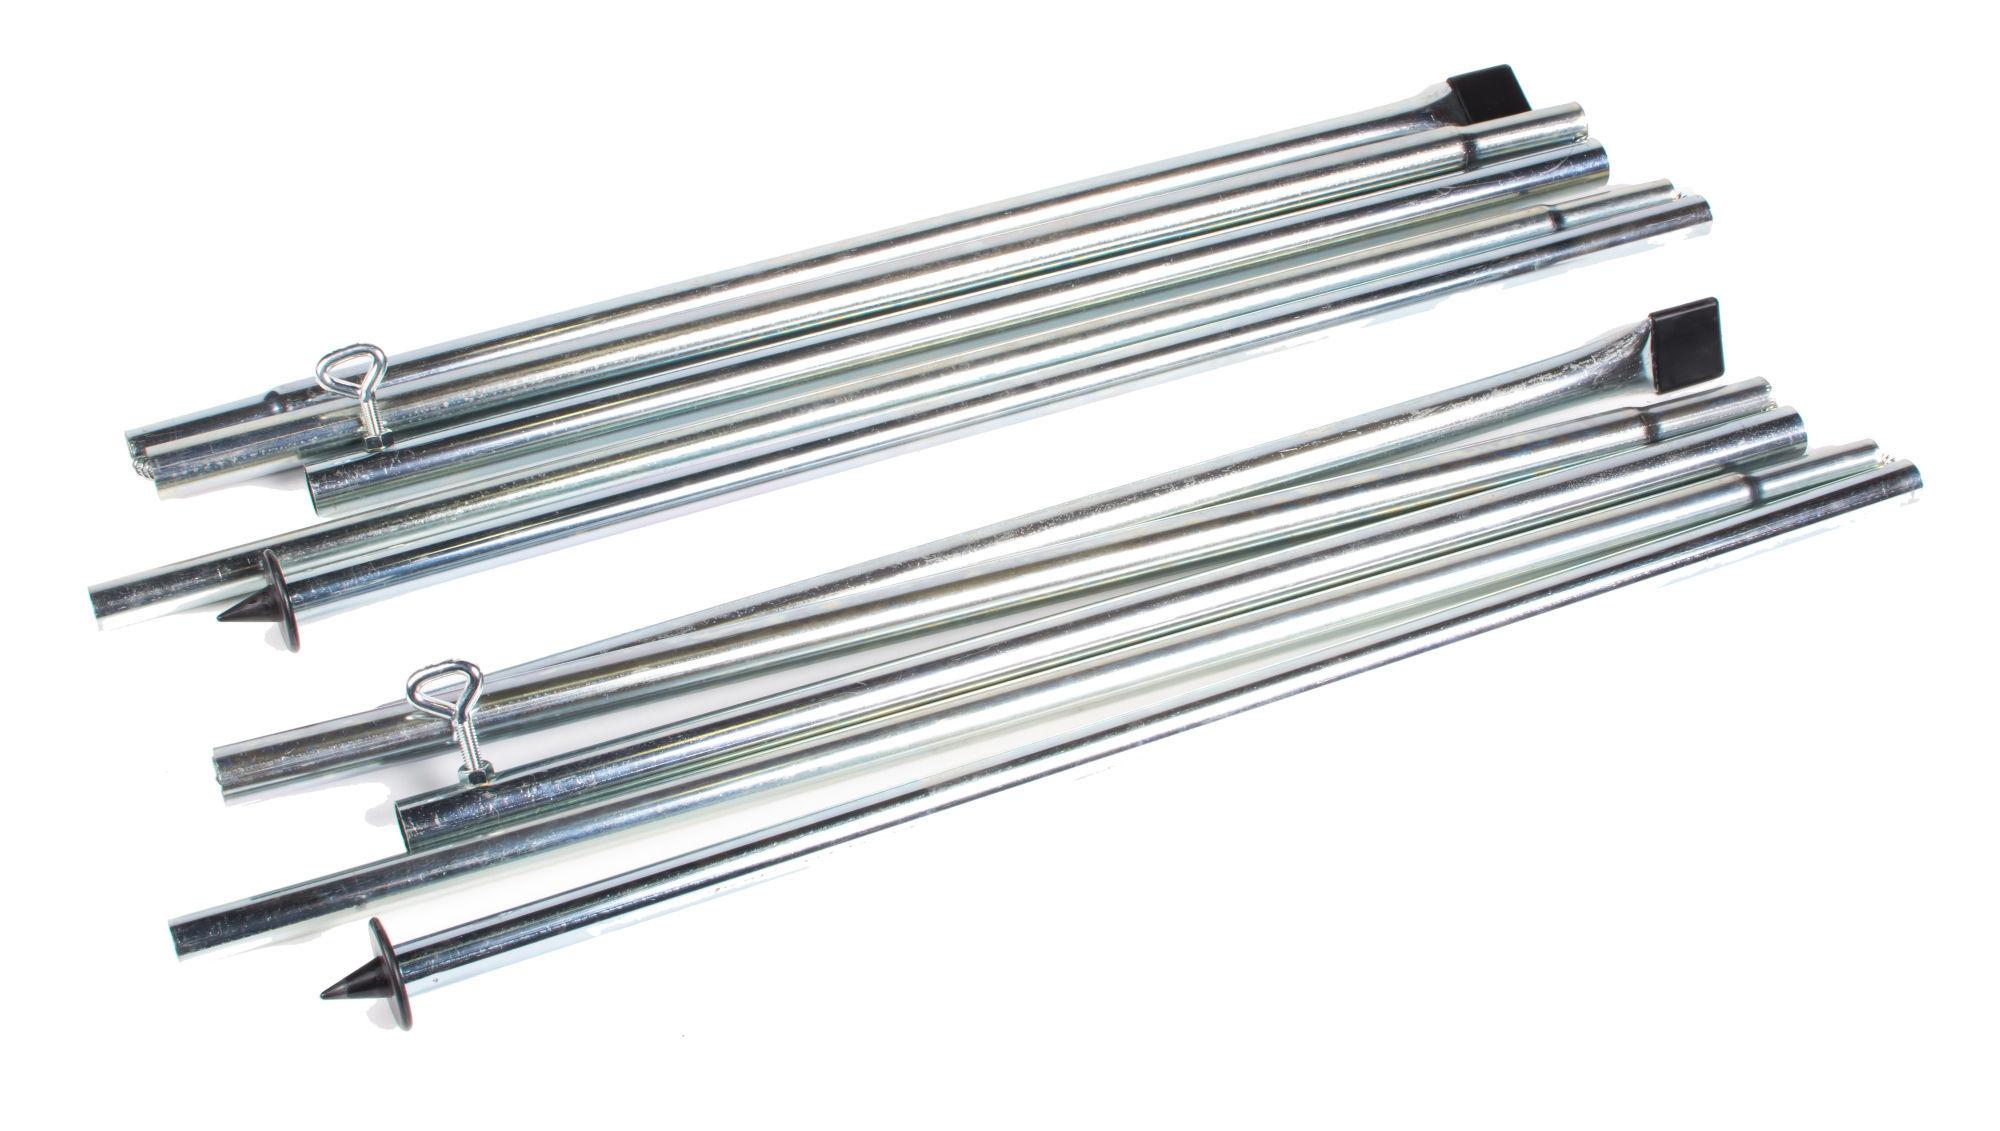 Kampa Andruckstangen Stahl F 252 R Luftzelte 1 Paar